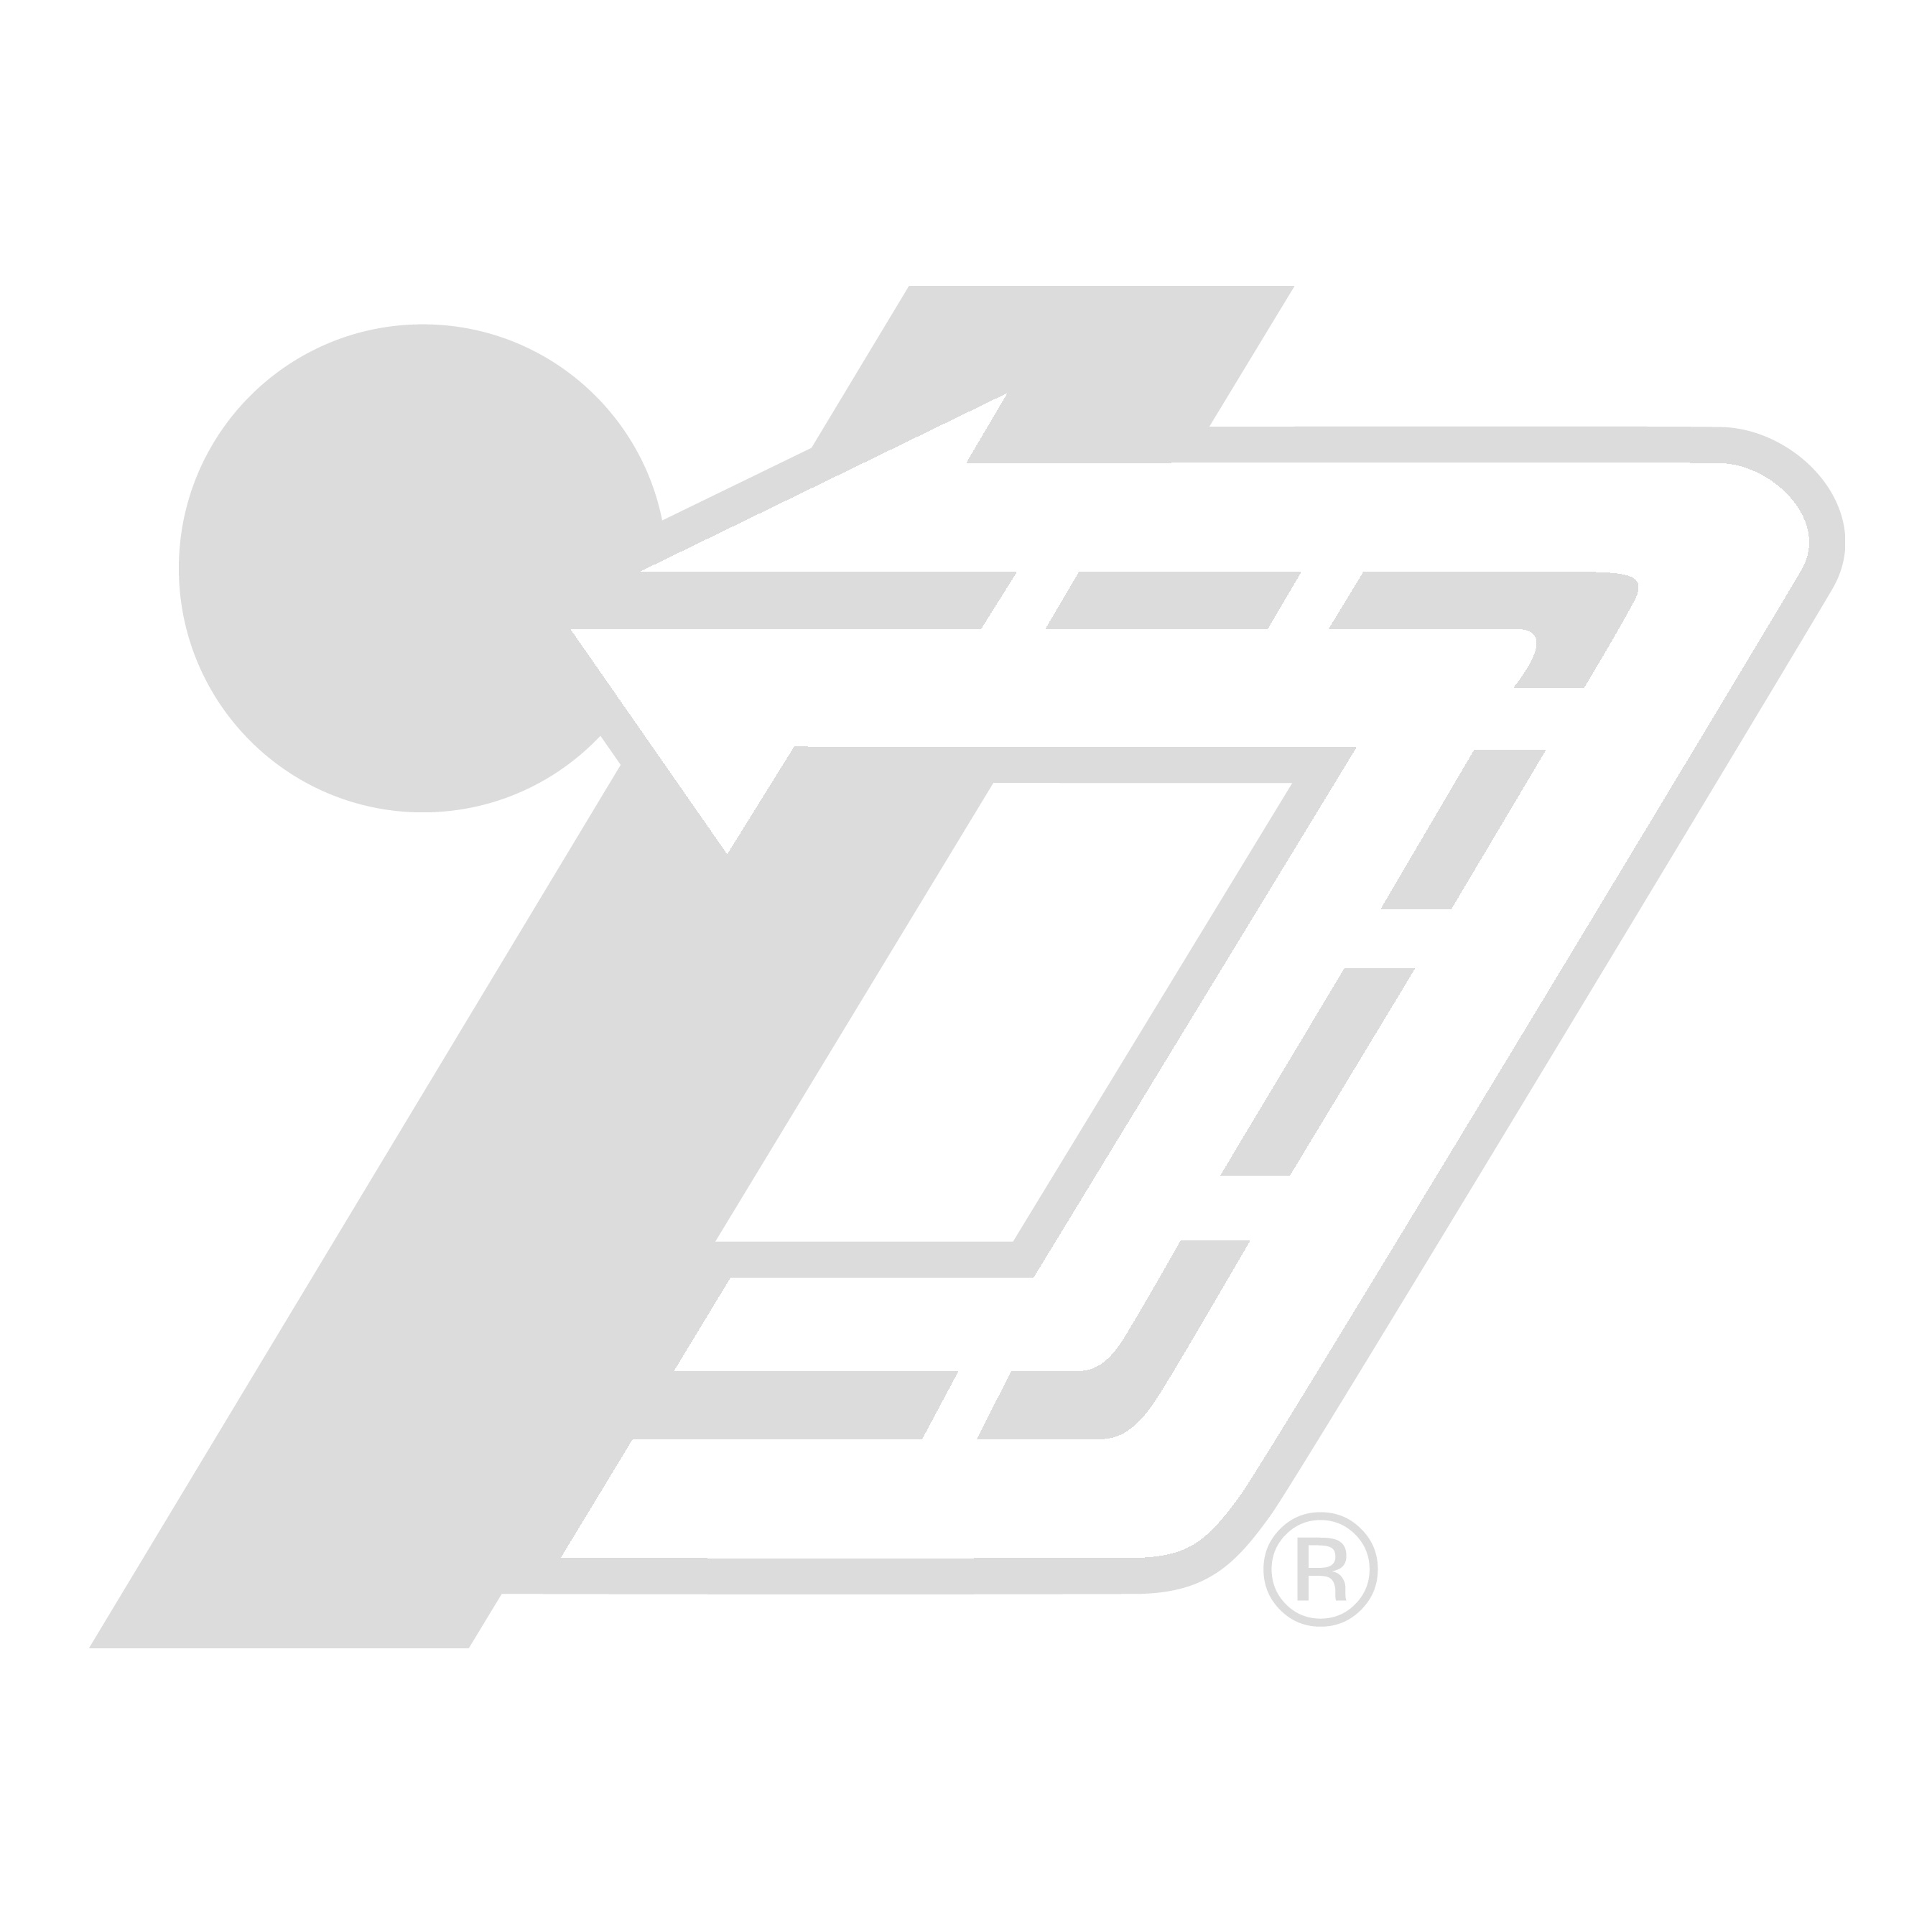 TrafFix Metro-A-Cade Leg - Yellow